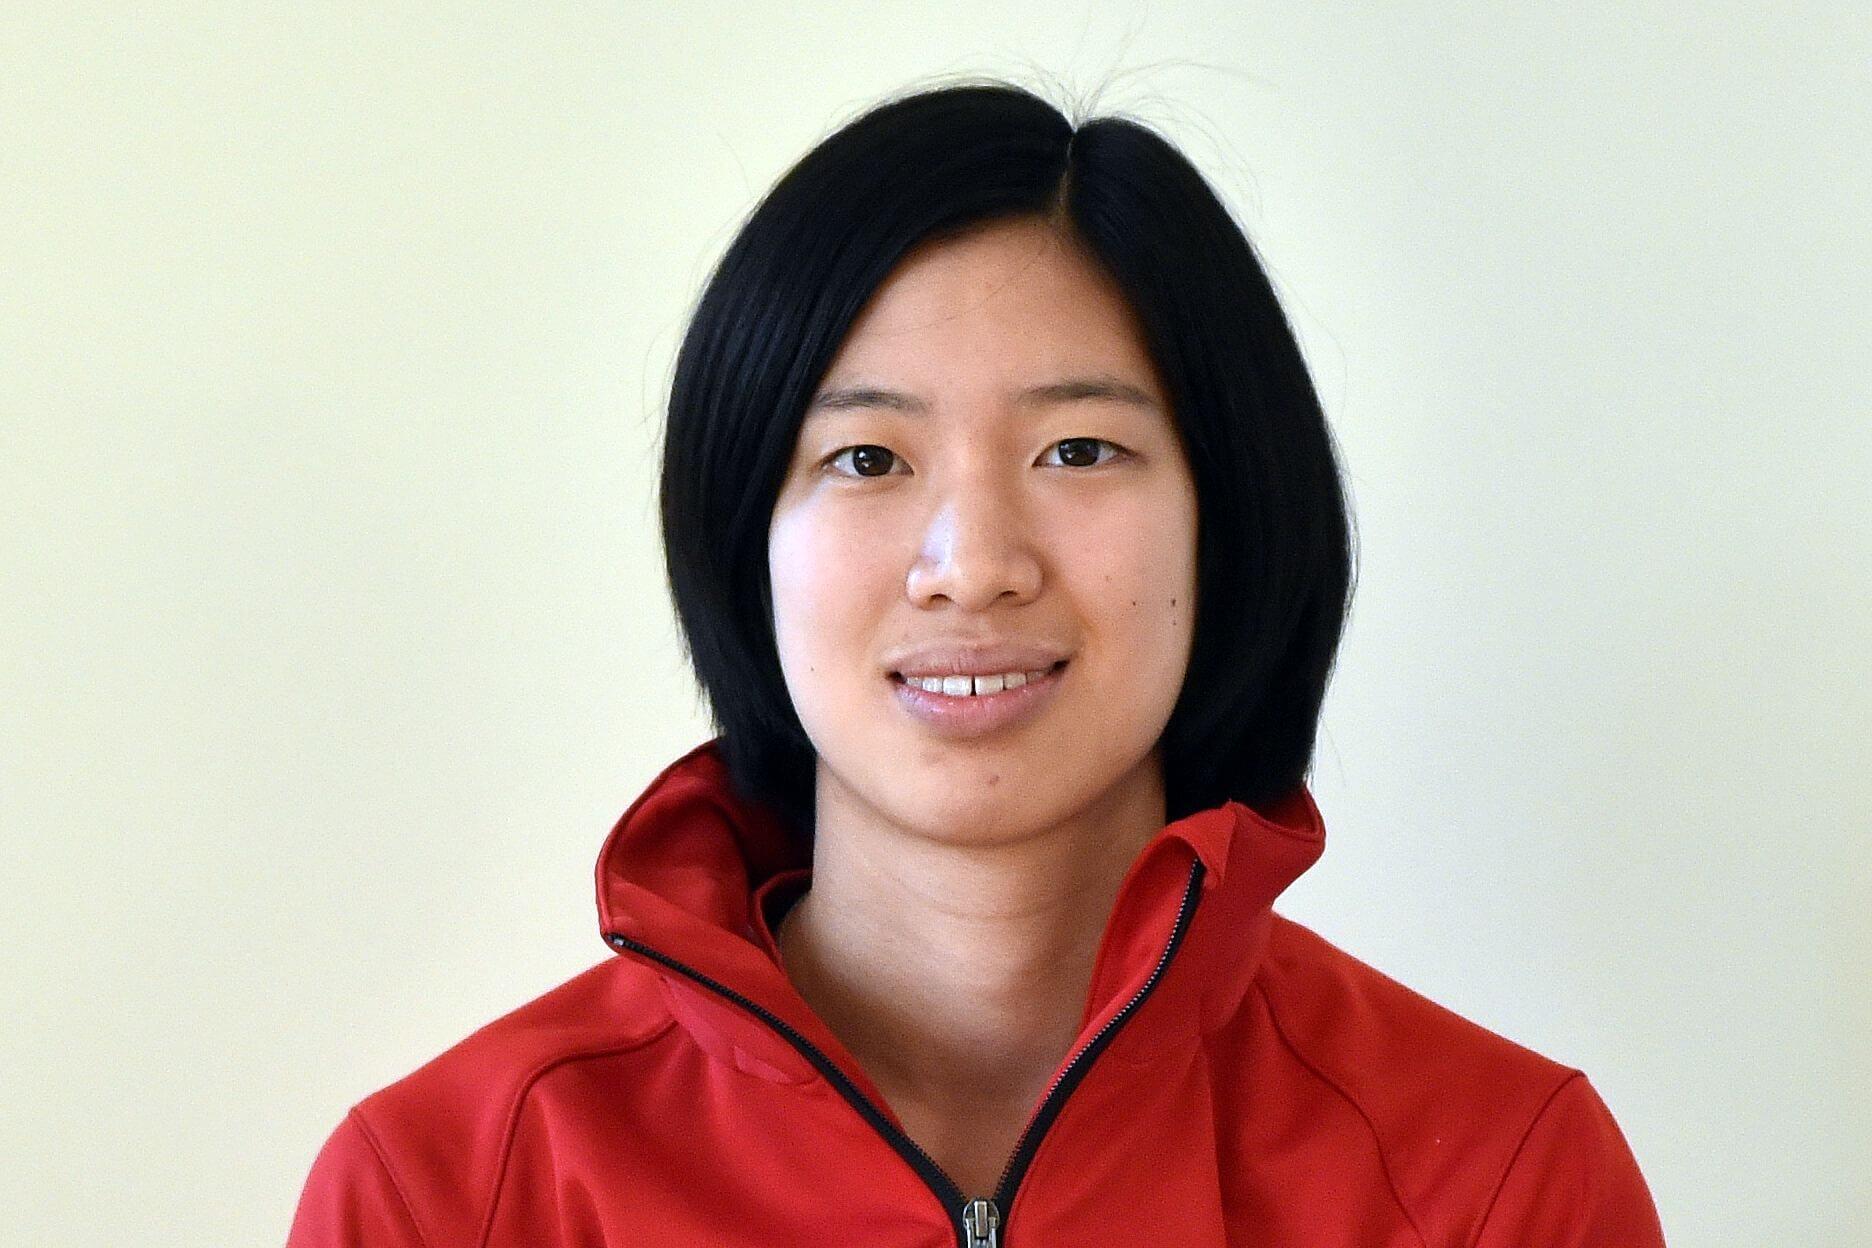 OSP-Athletin Yvonne Li (Bild: Claudia Pauli)